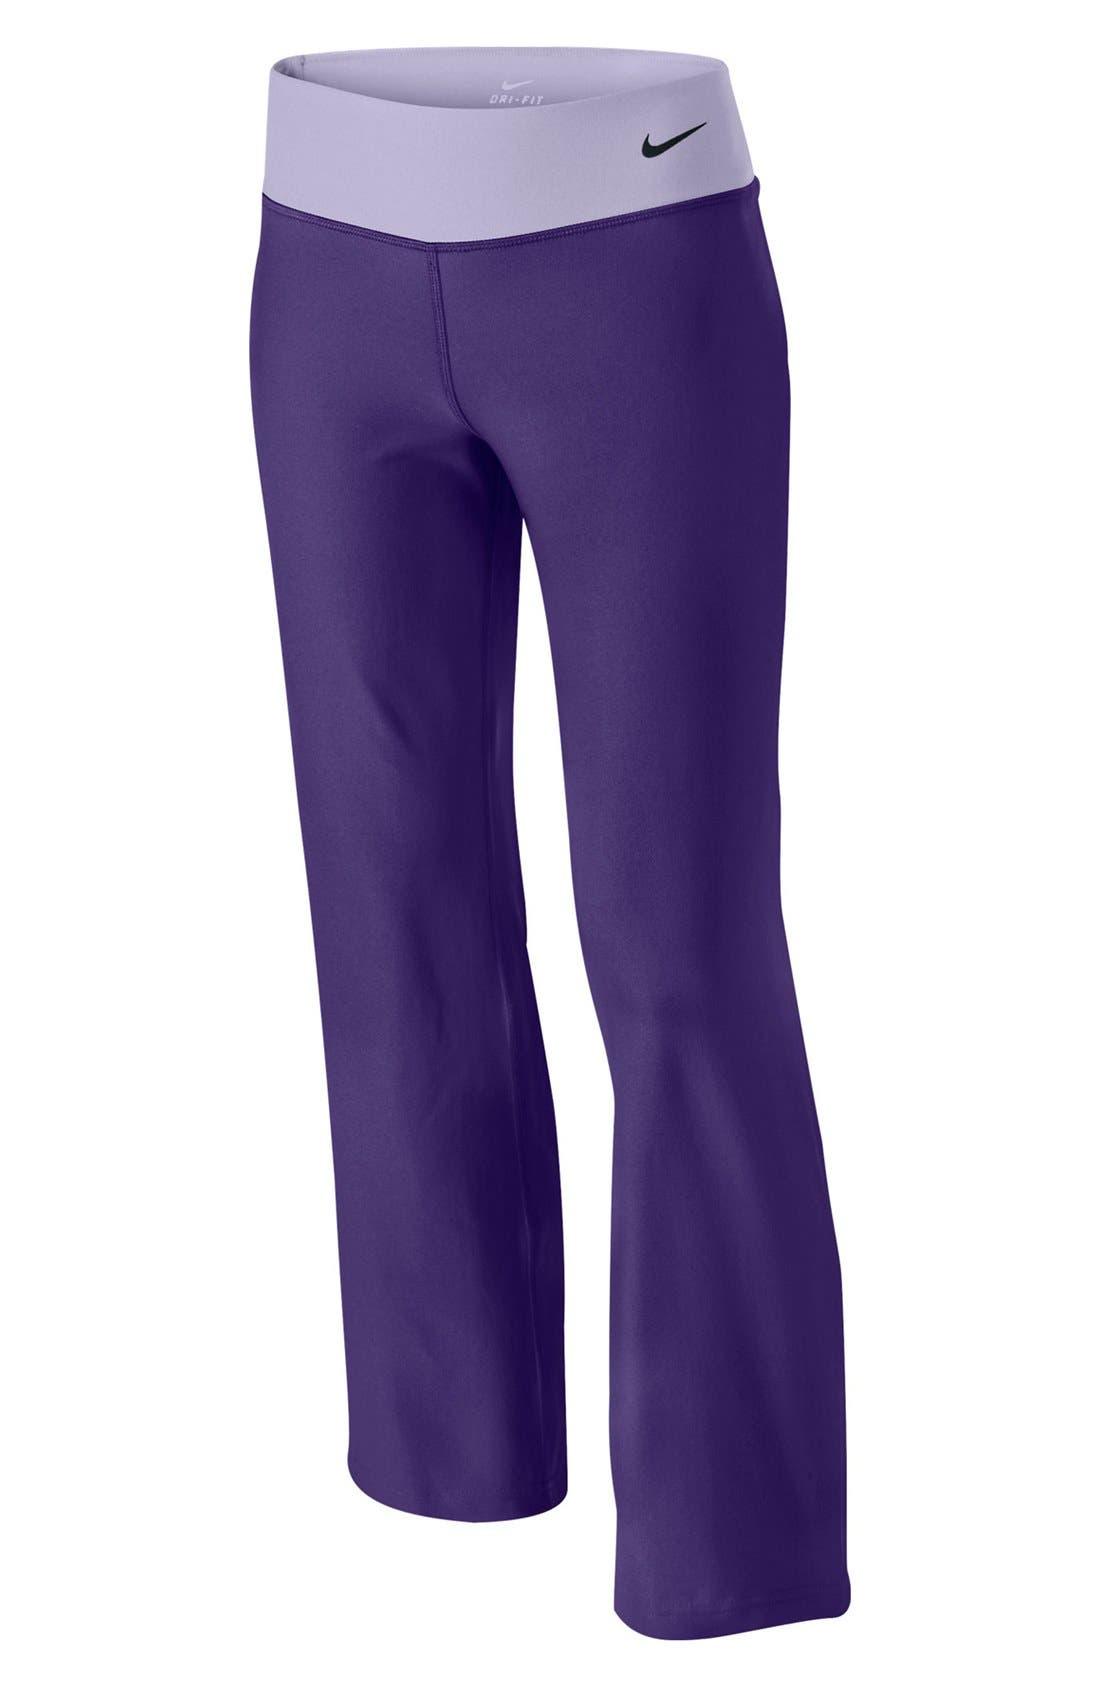 Main Image - Nike 'Legend' Pants (Big Girls)